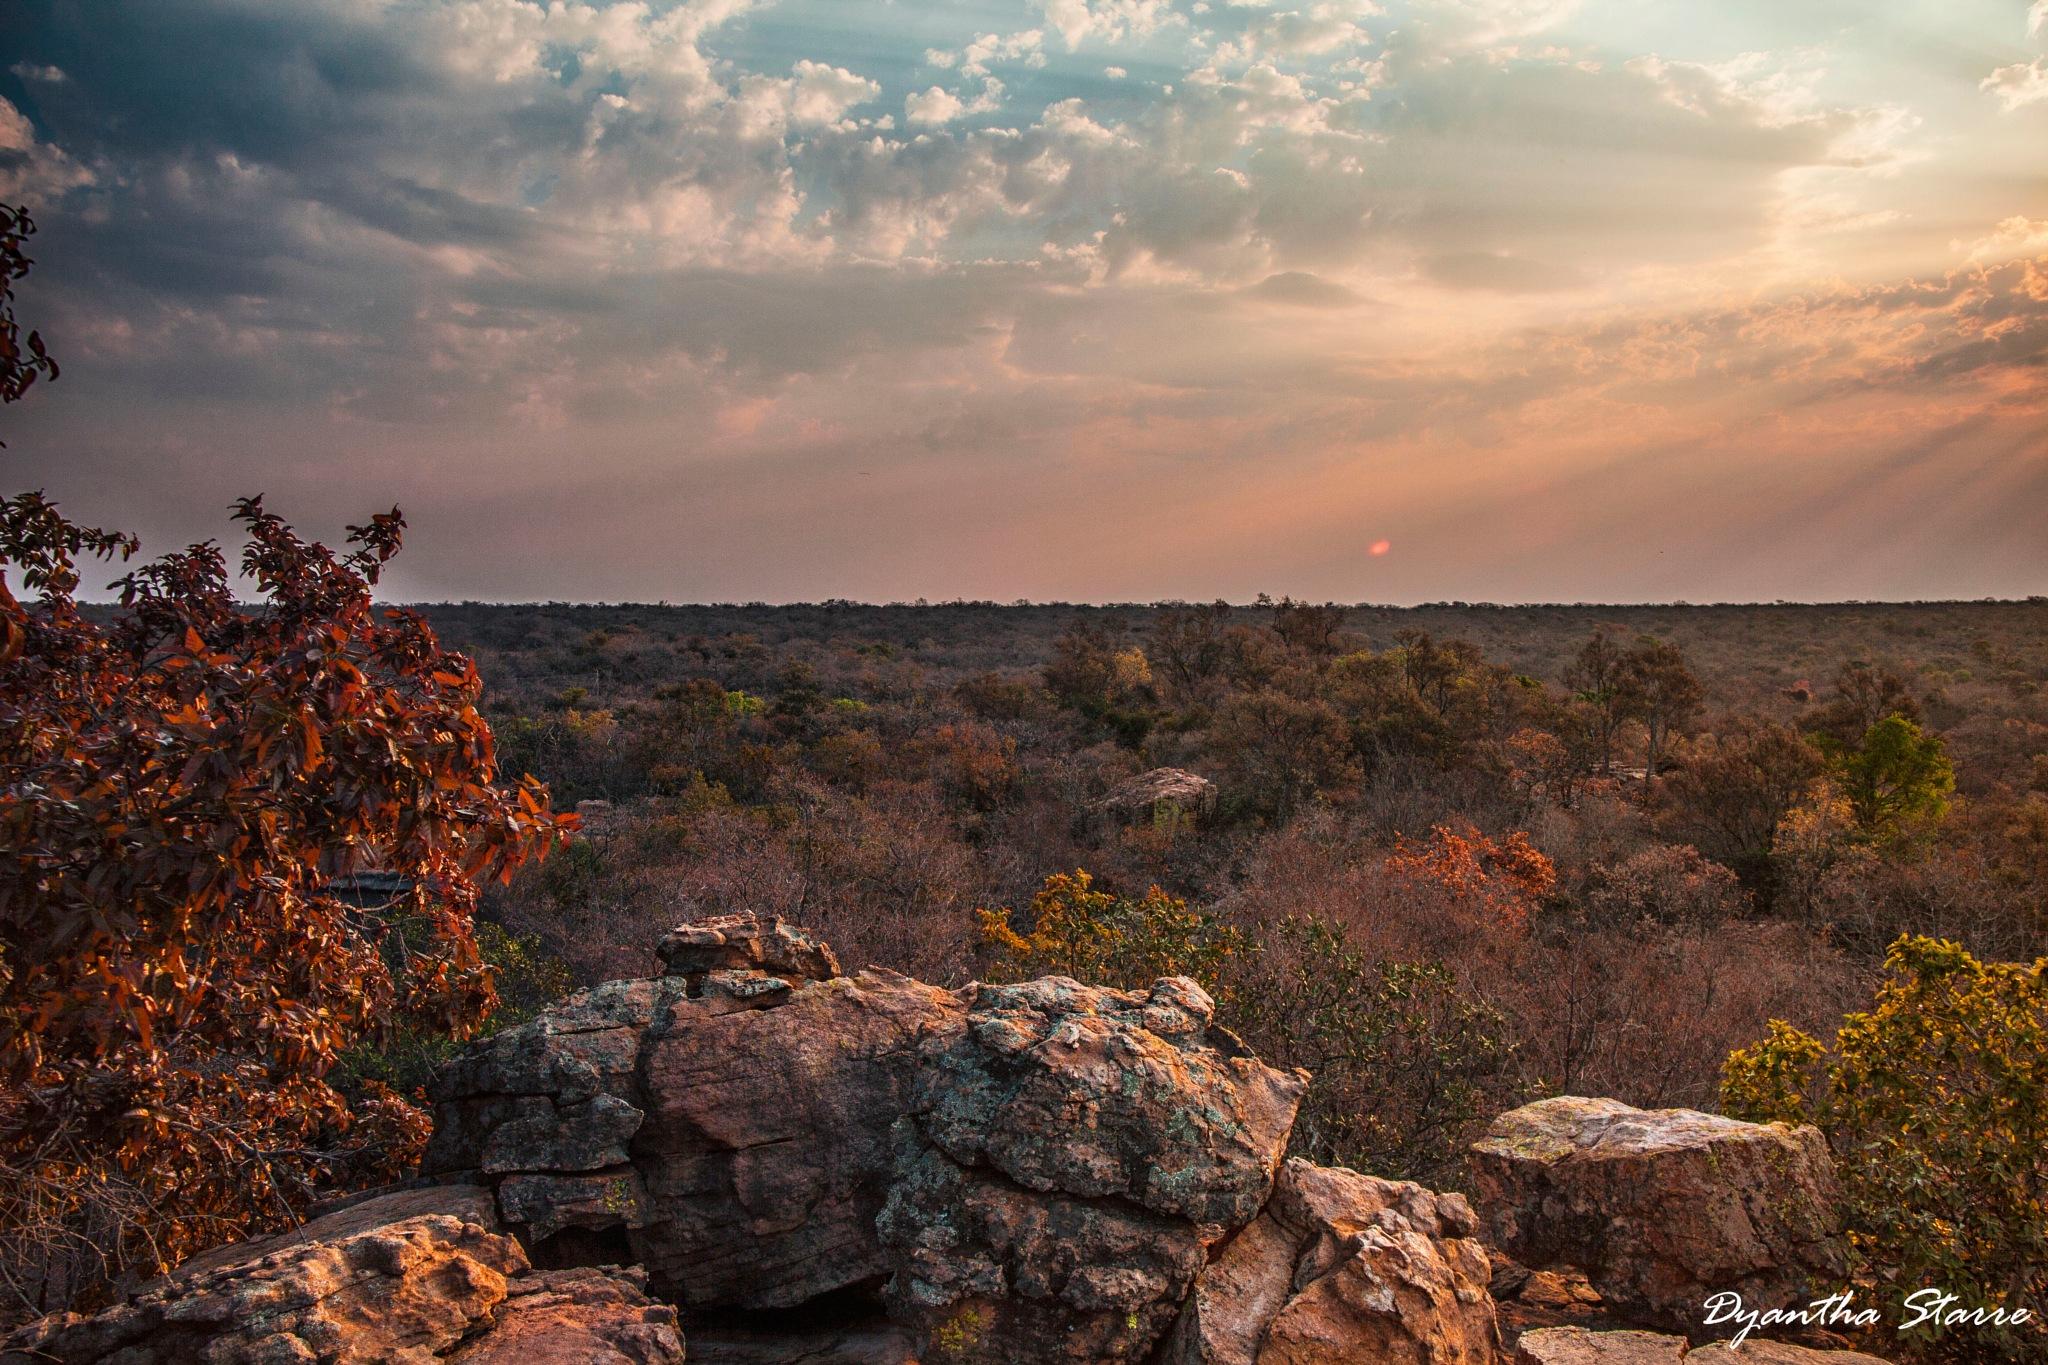 African landscape by Dyantha Starre